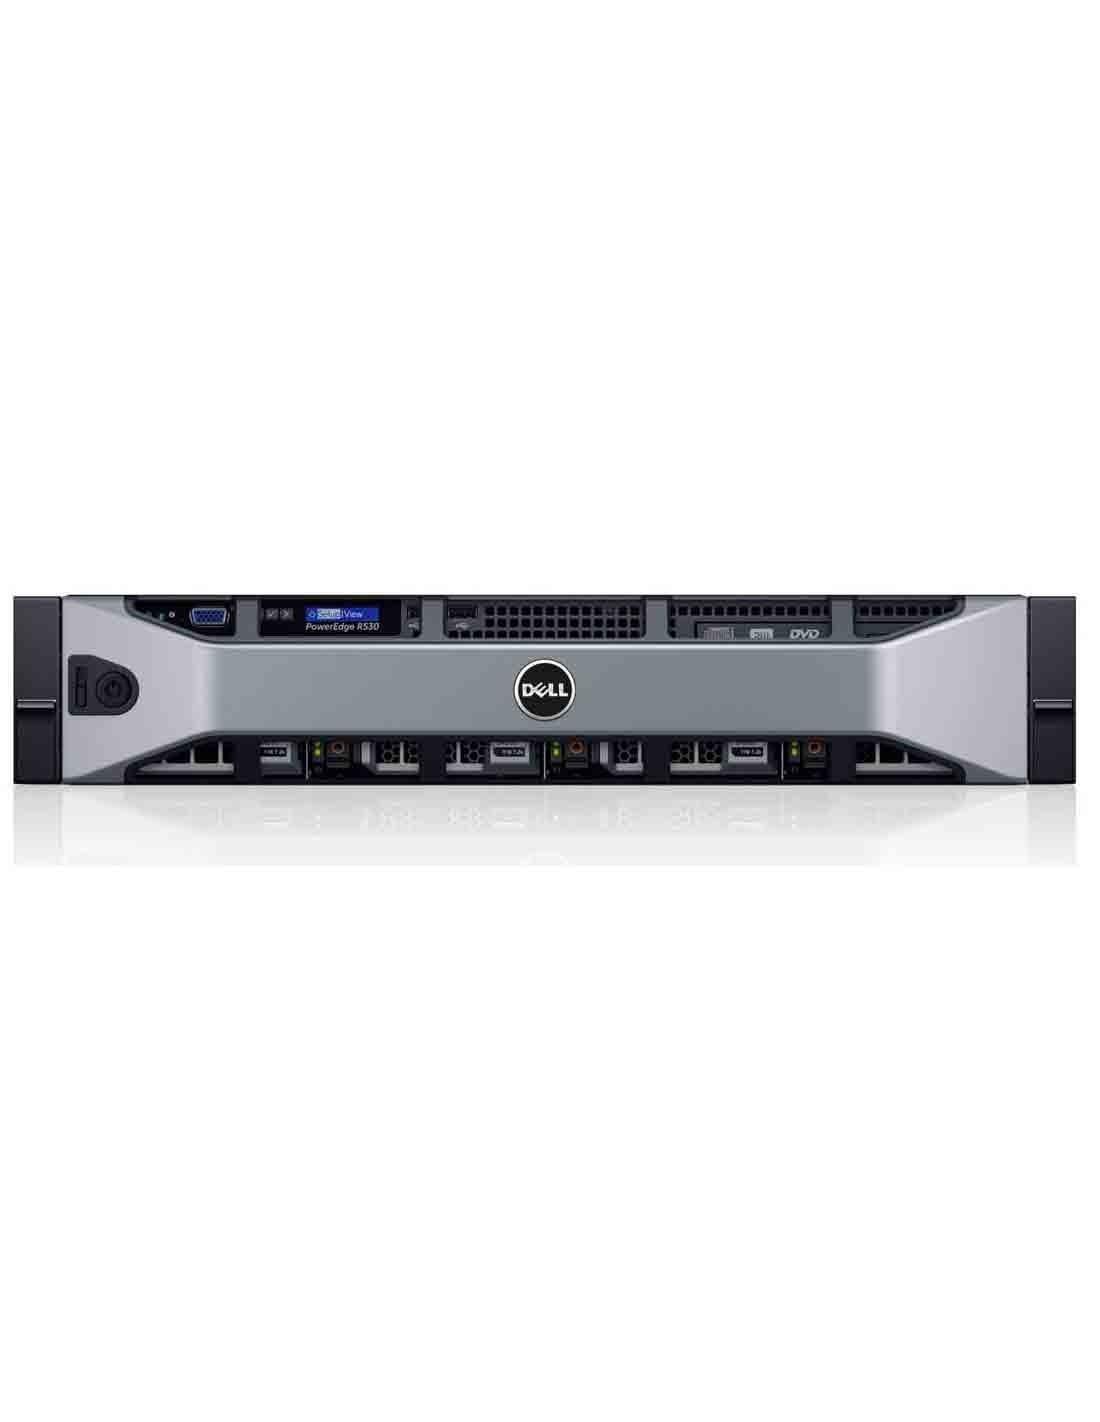 Dell PowerEdge R530 Rack Server Dubai Online Shop